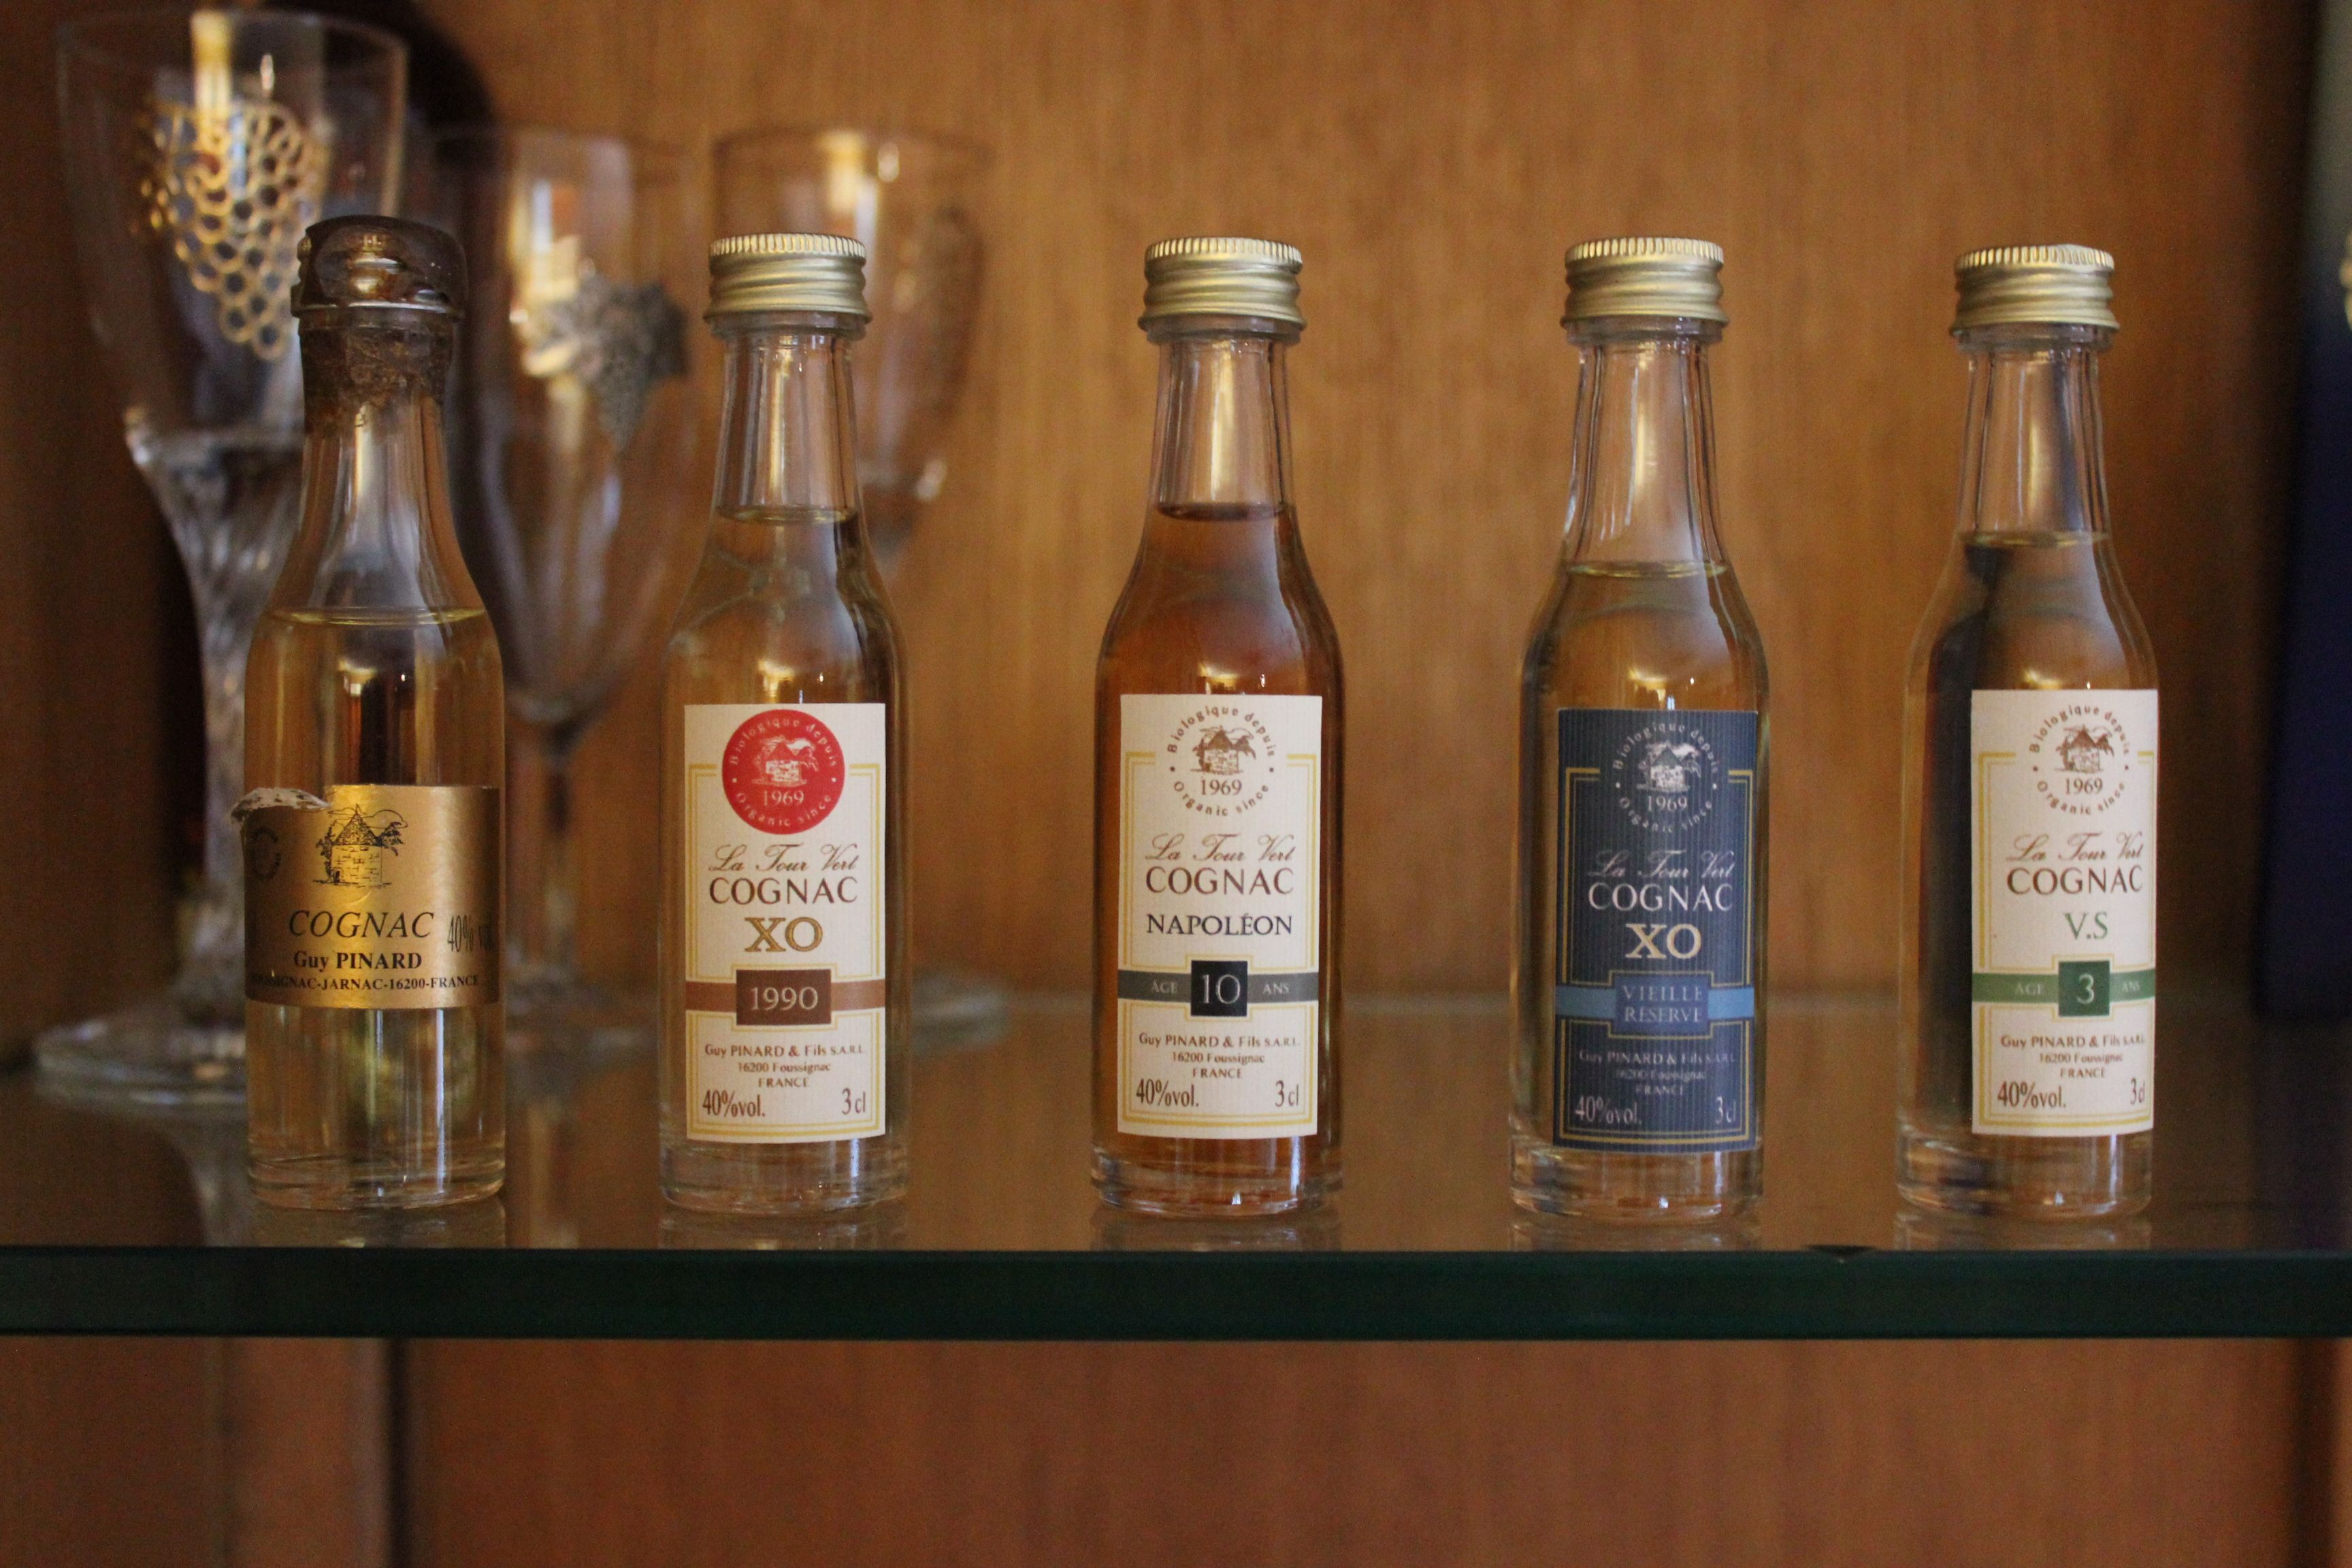 Guy Pinard家的mini小瓶干邑,颇具代表性的有机干邑